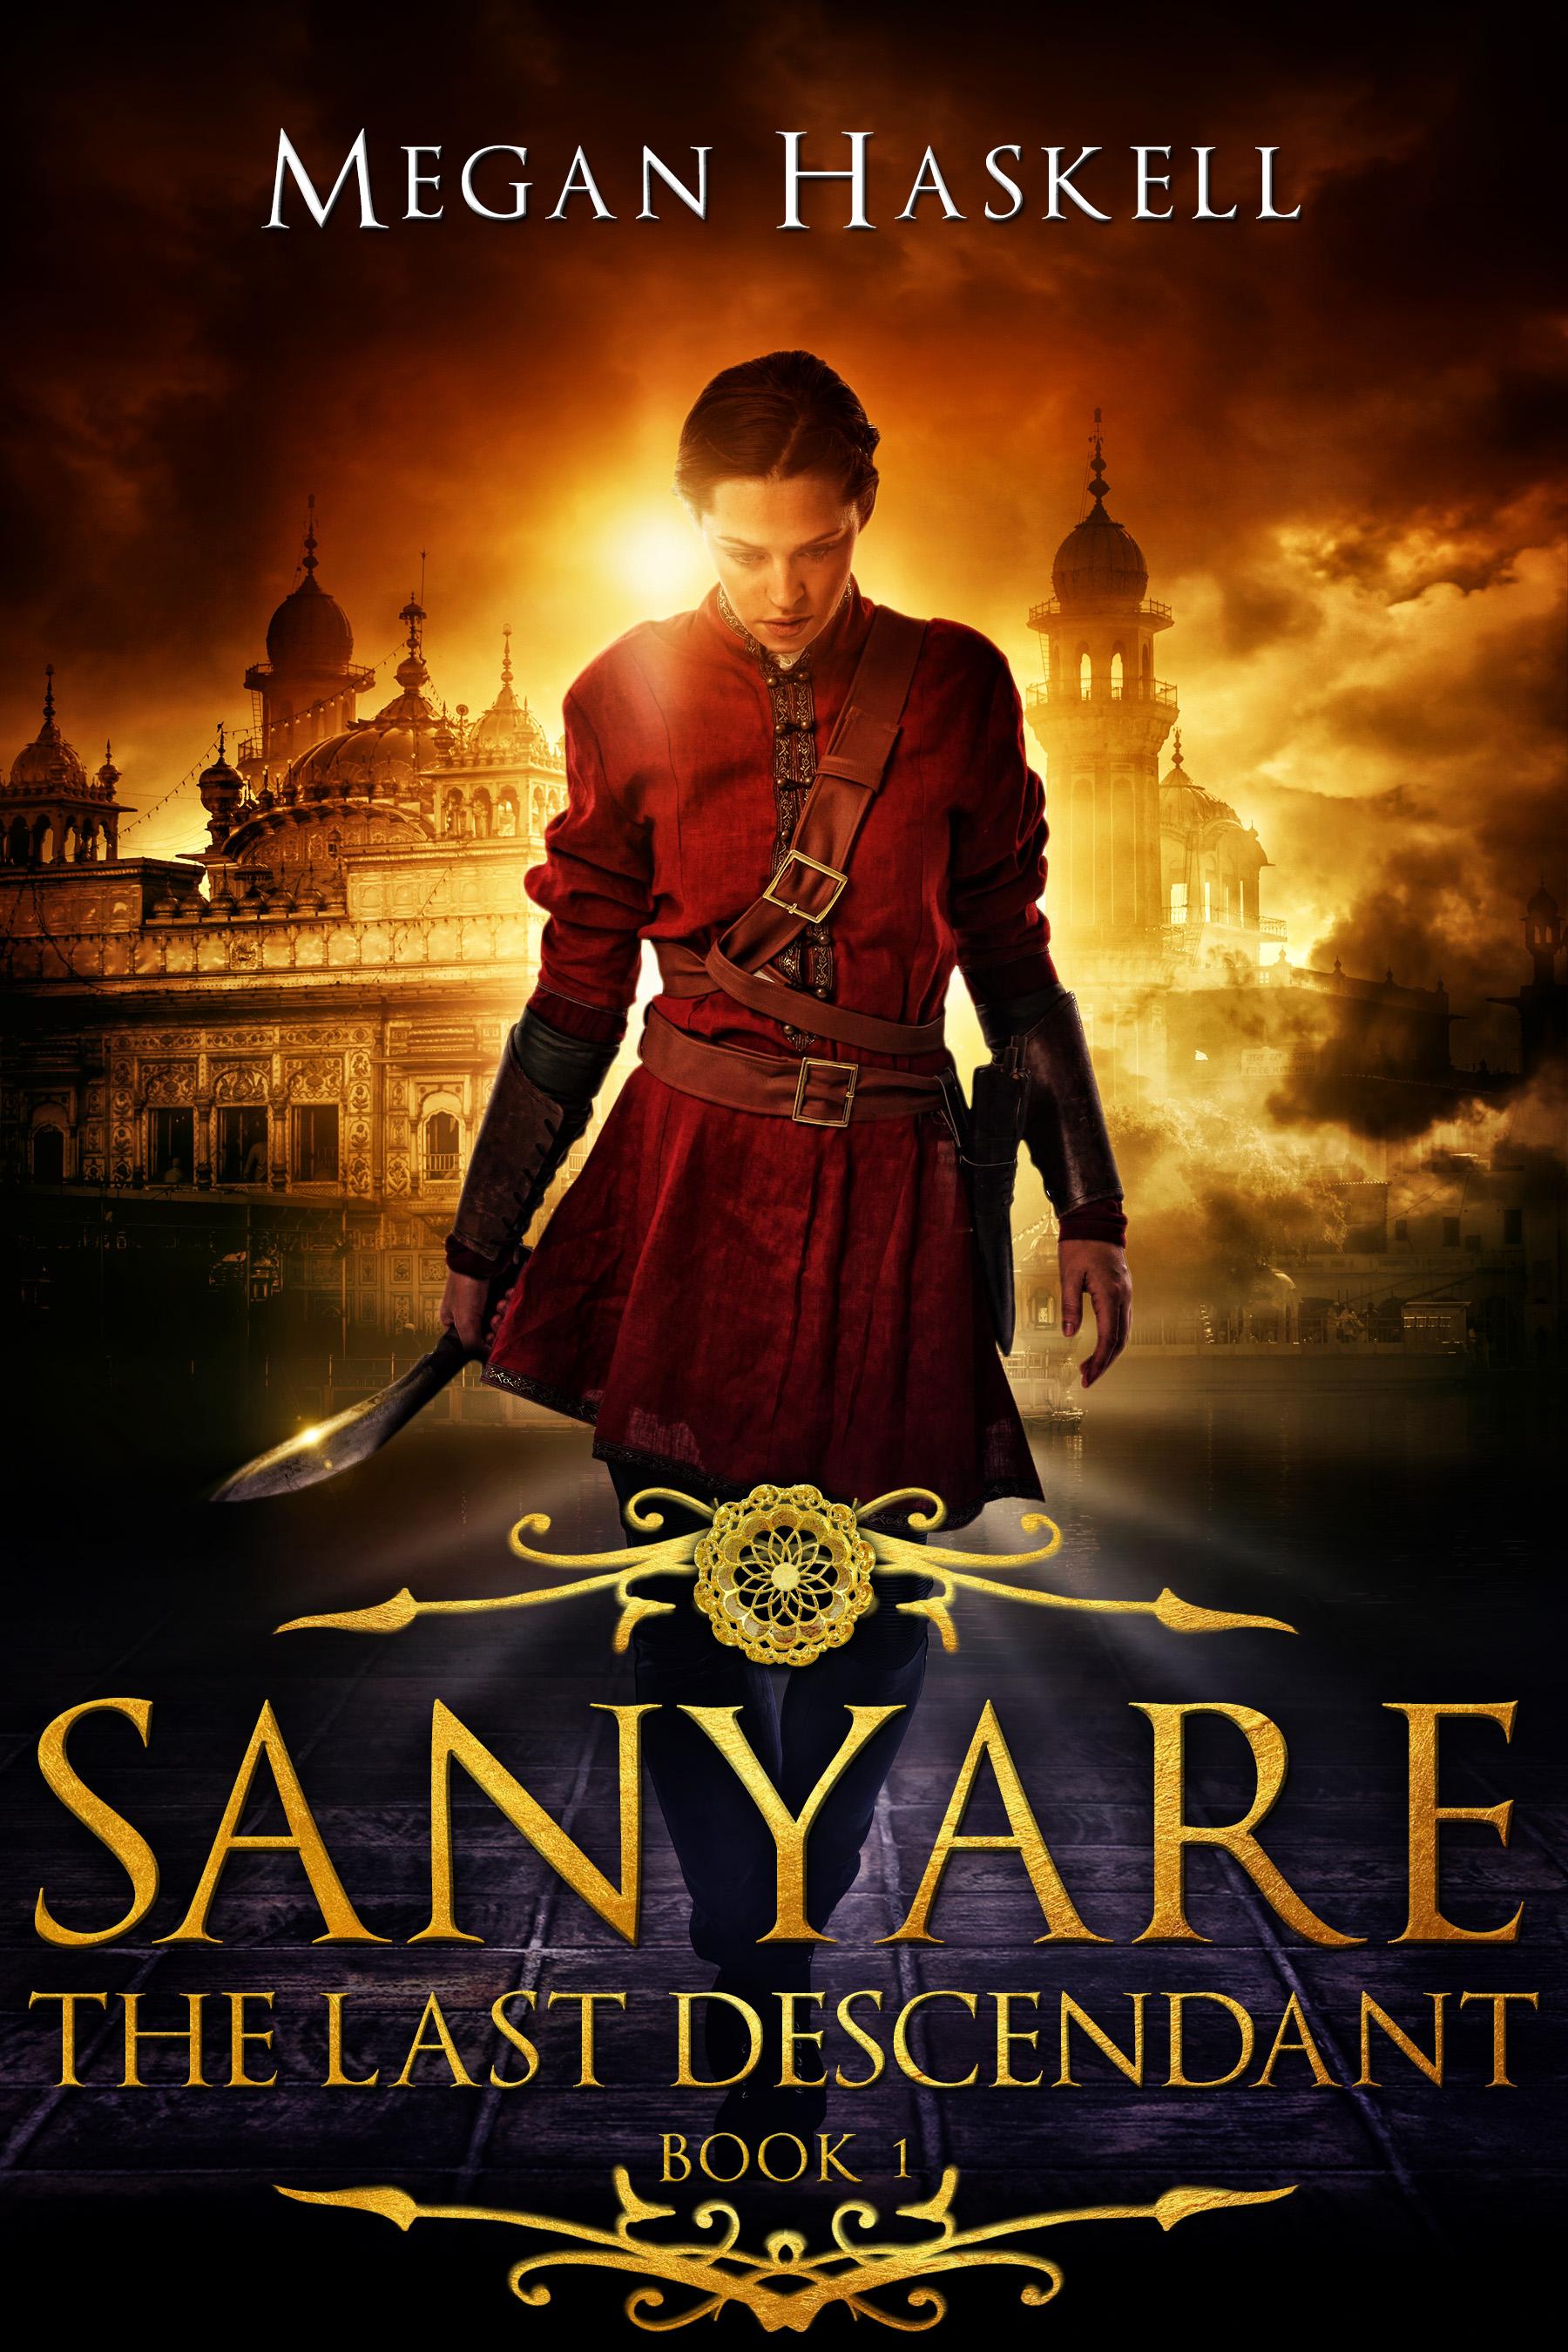 Boom!  Sanyare: The Last Descendant  has a new look!